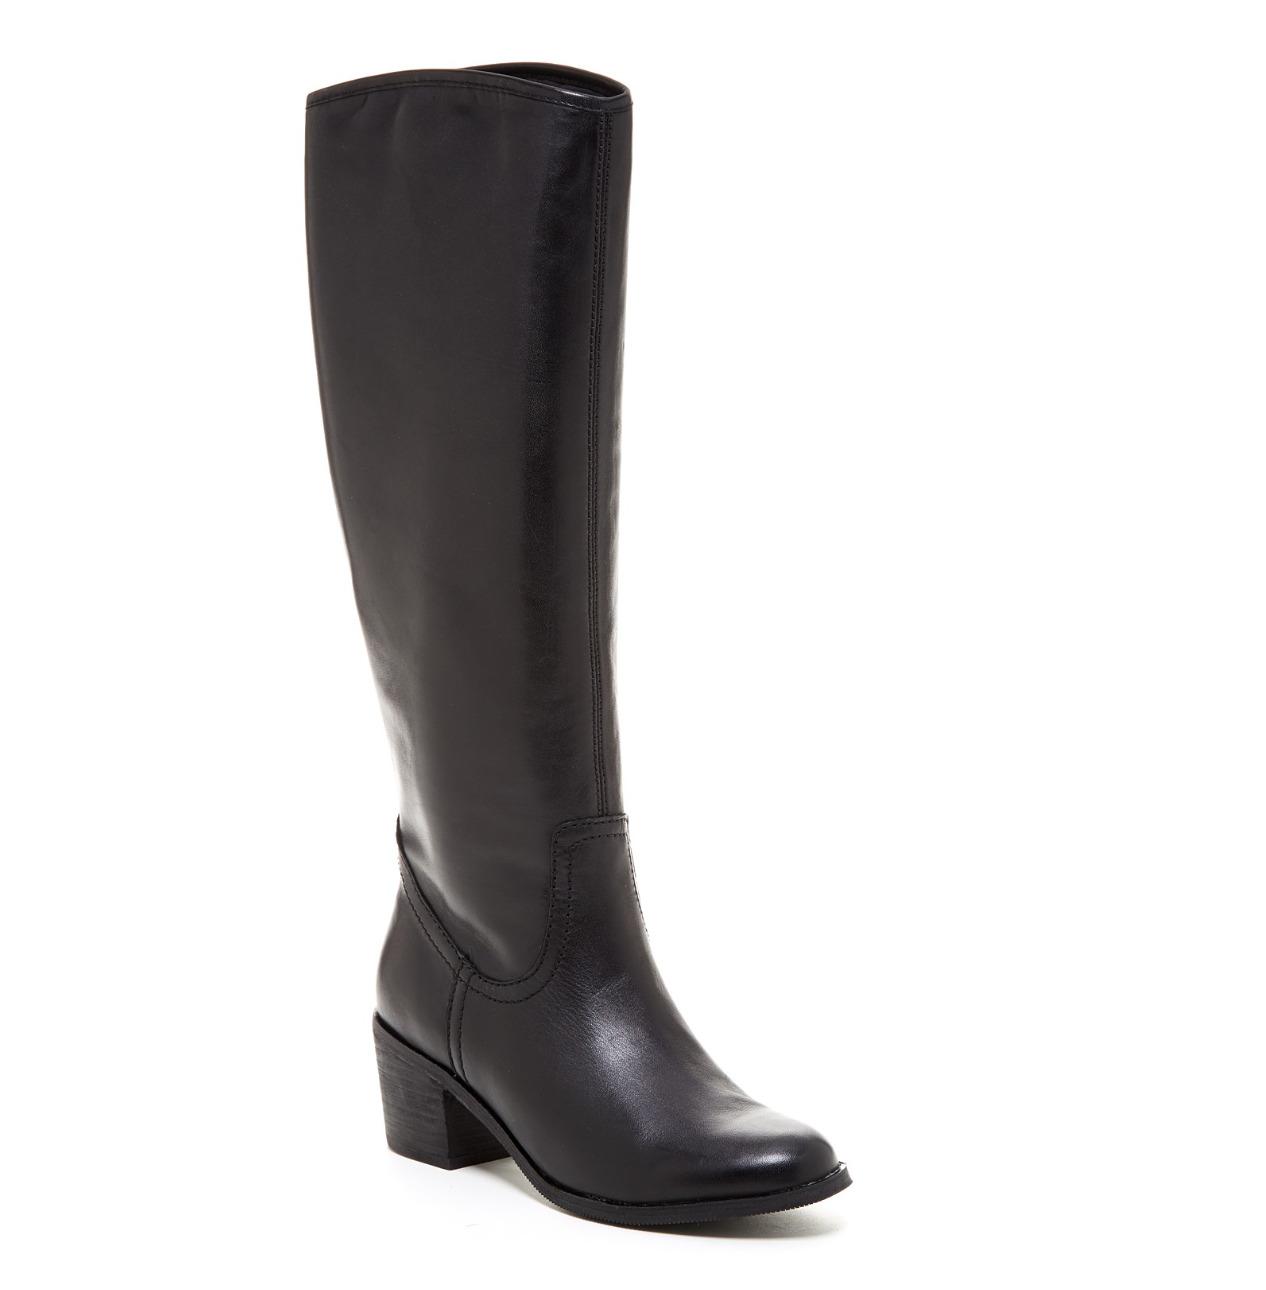 Sam Edelman Loren Leather Boot Black Women Sz 7 M 5783 *